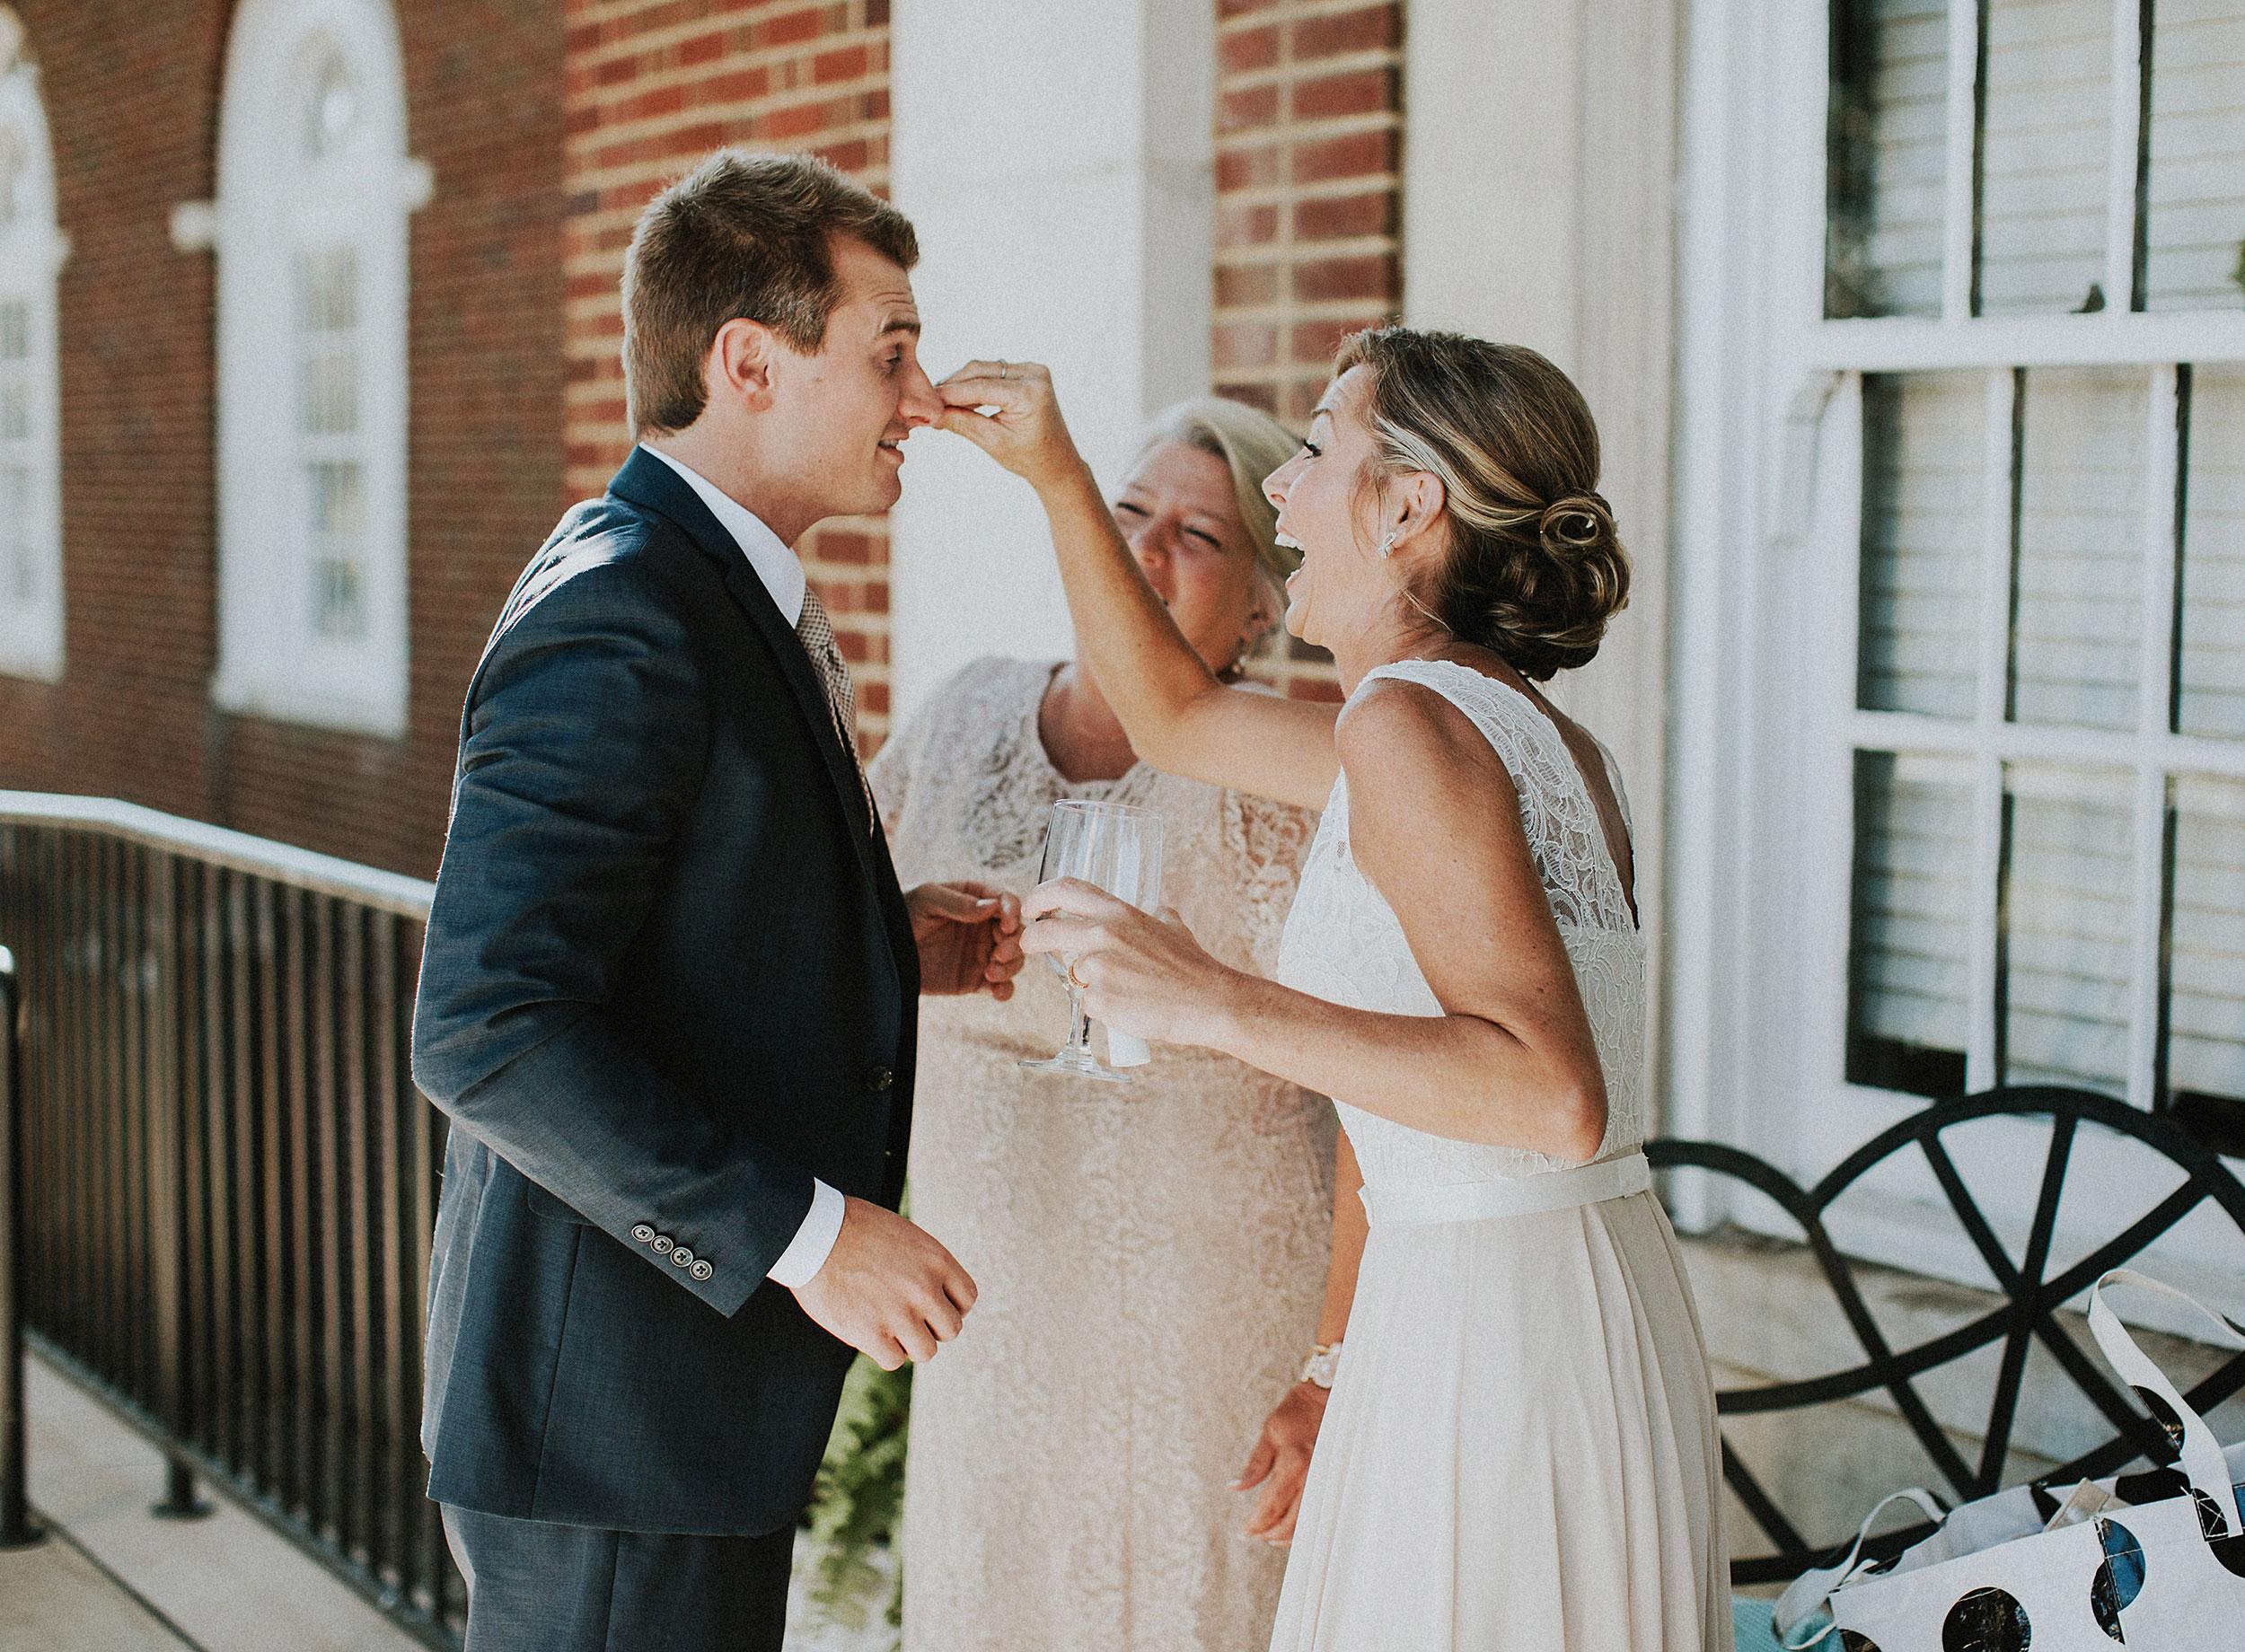 olmsted-wedding-louisville-kentucky-020.JPG